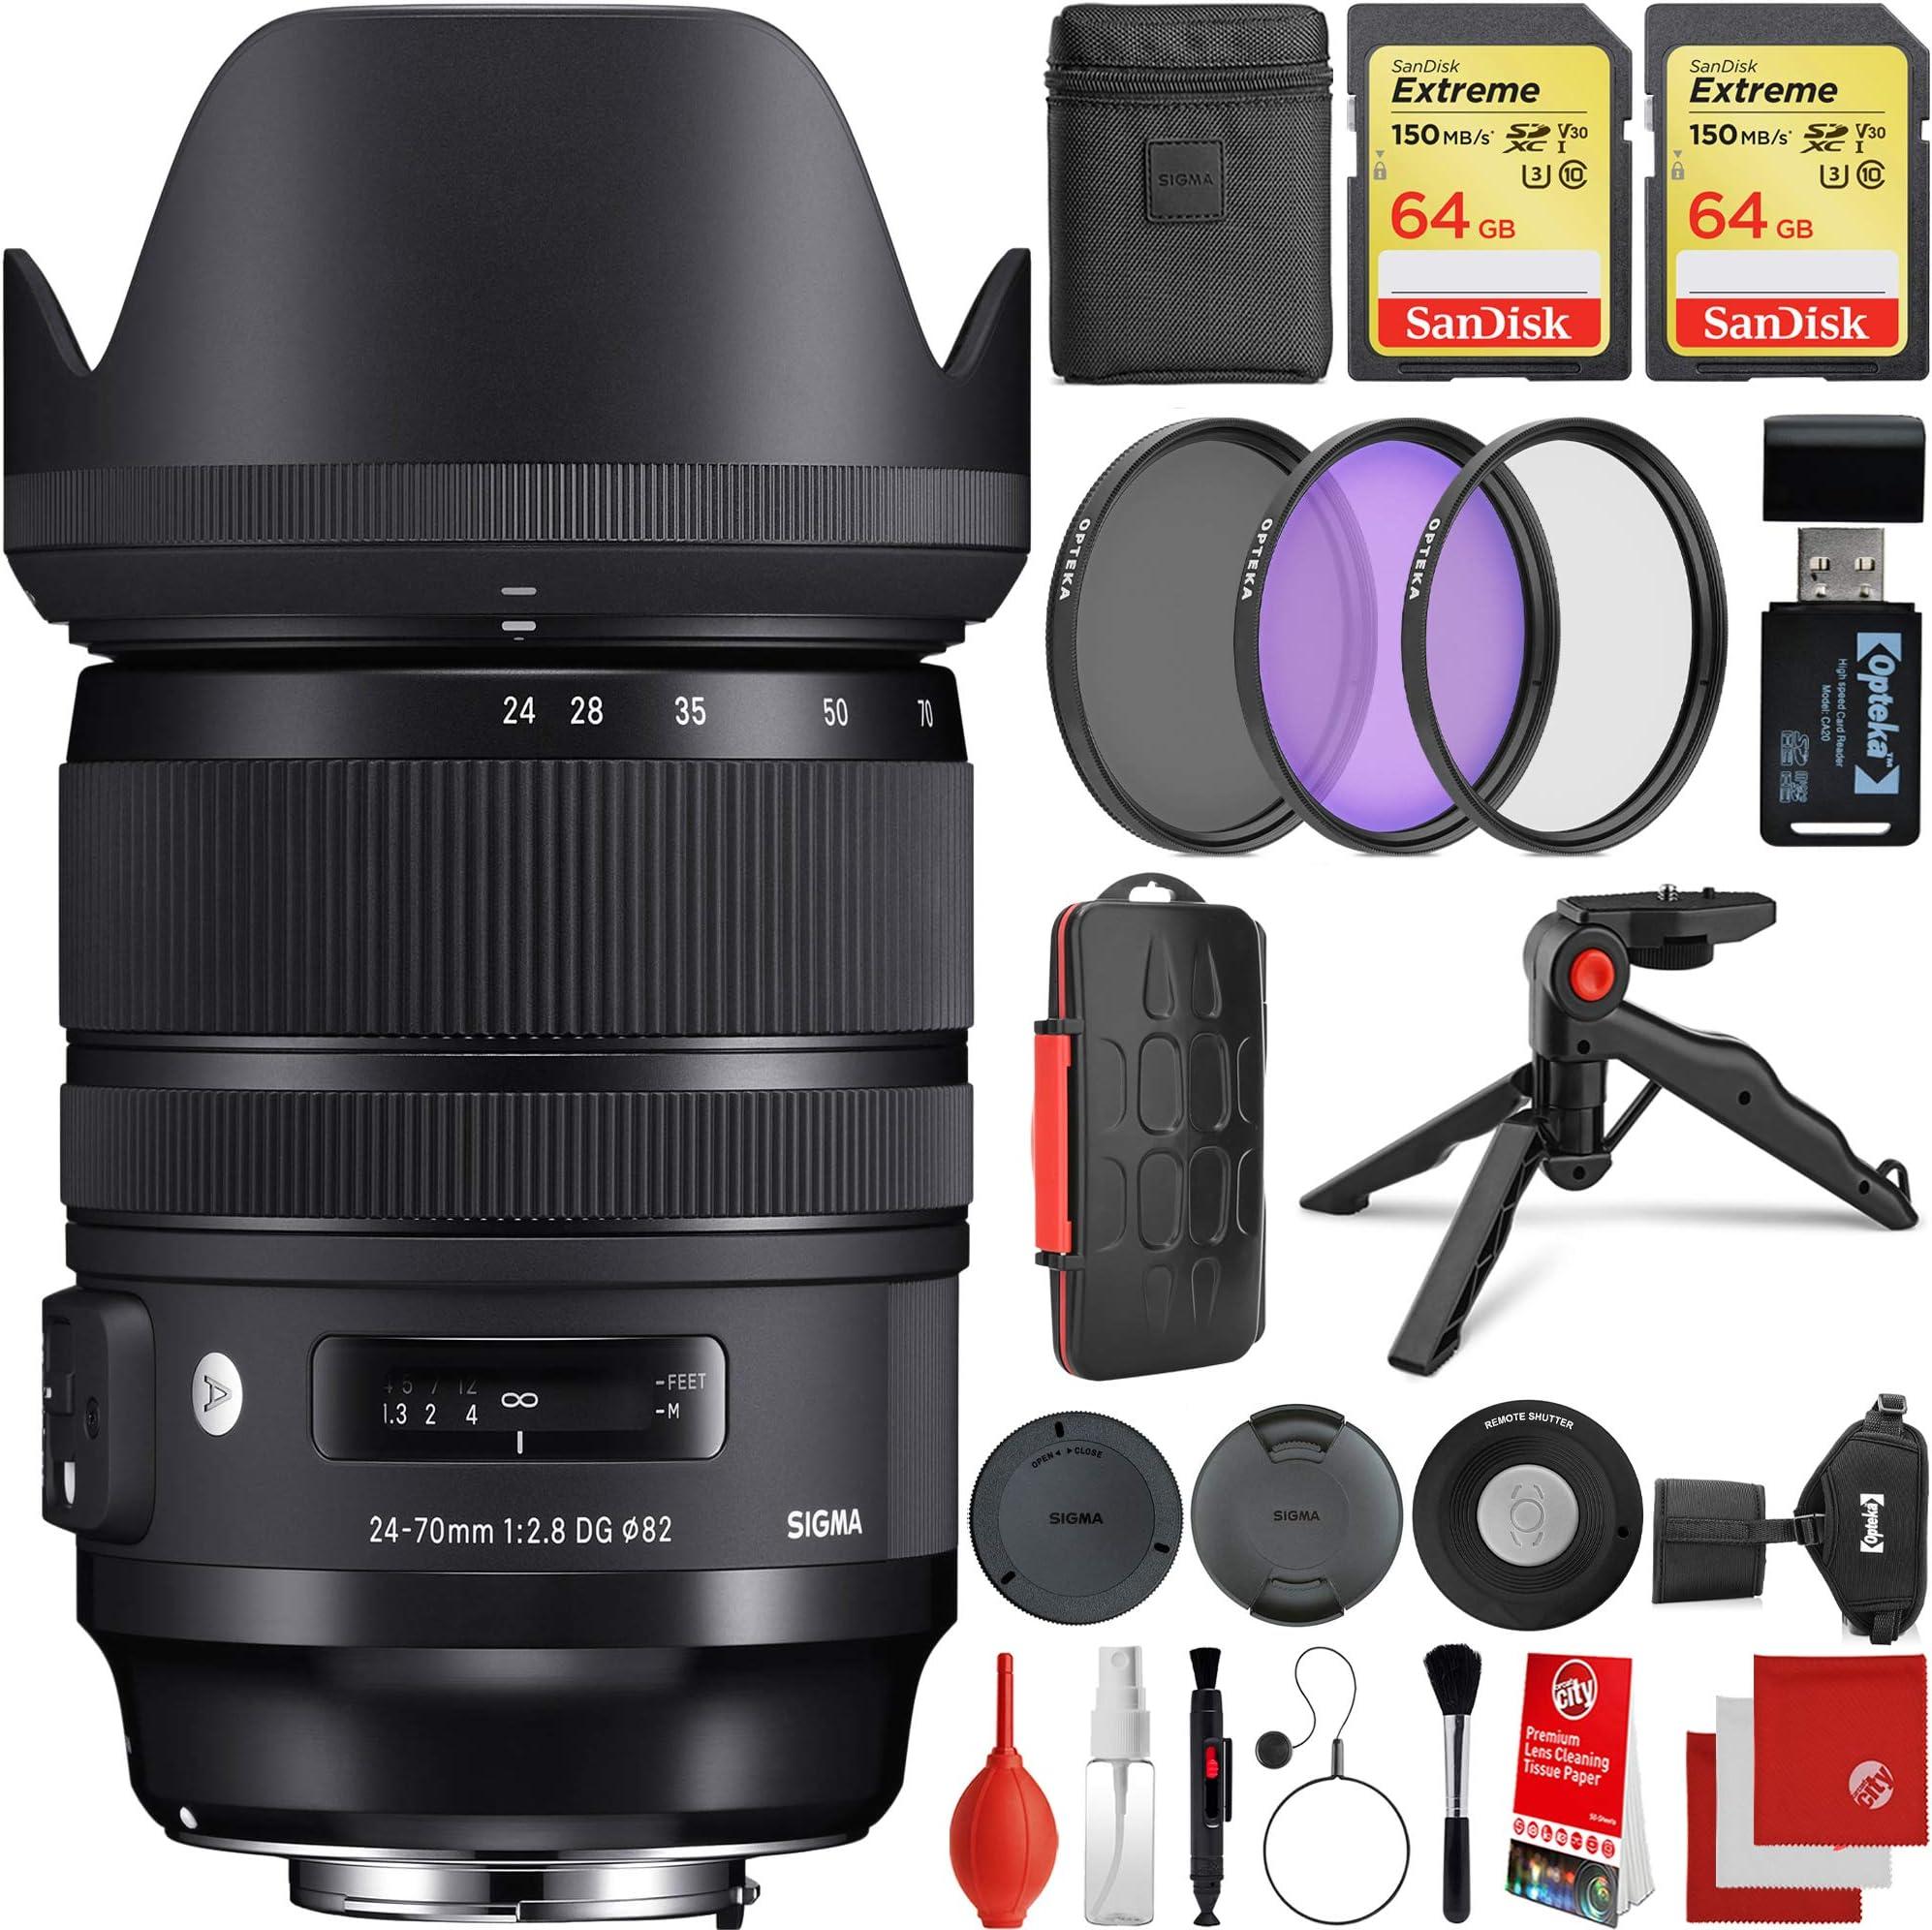 Sigma 24-70mm f/2.8 DG DN Art Lens Sony E-Mount Bundle, 2X 64GB Memory Cards, IR Remote, 3 Piece Filter Kit, Wrist Strap, Card Reader, Memory Card Case, Tabletop Tripod